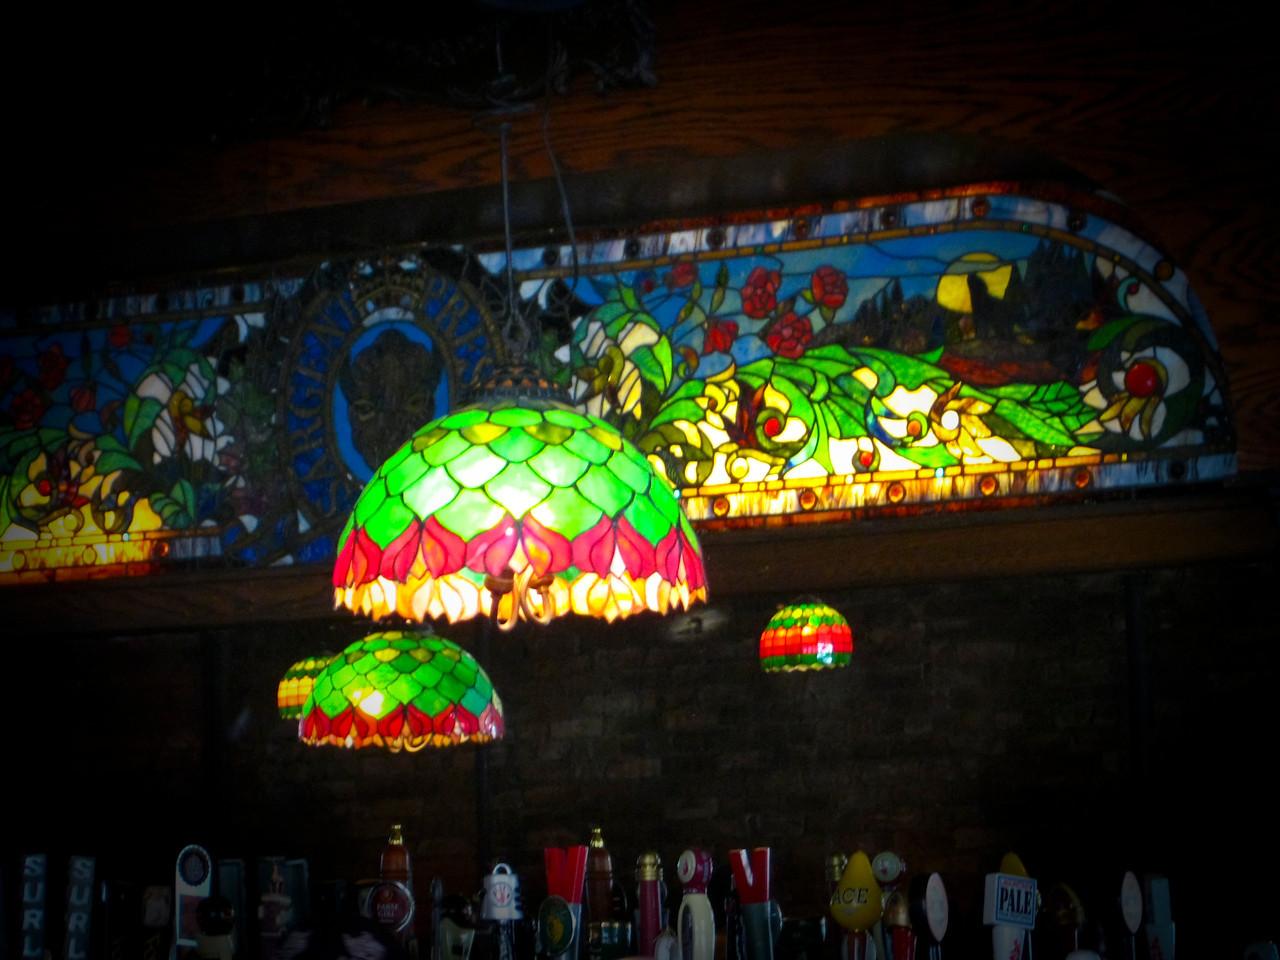 Nice looking Tiffany glass art